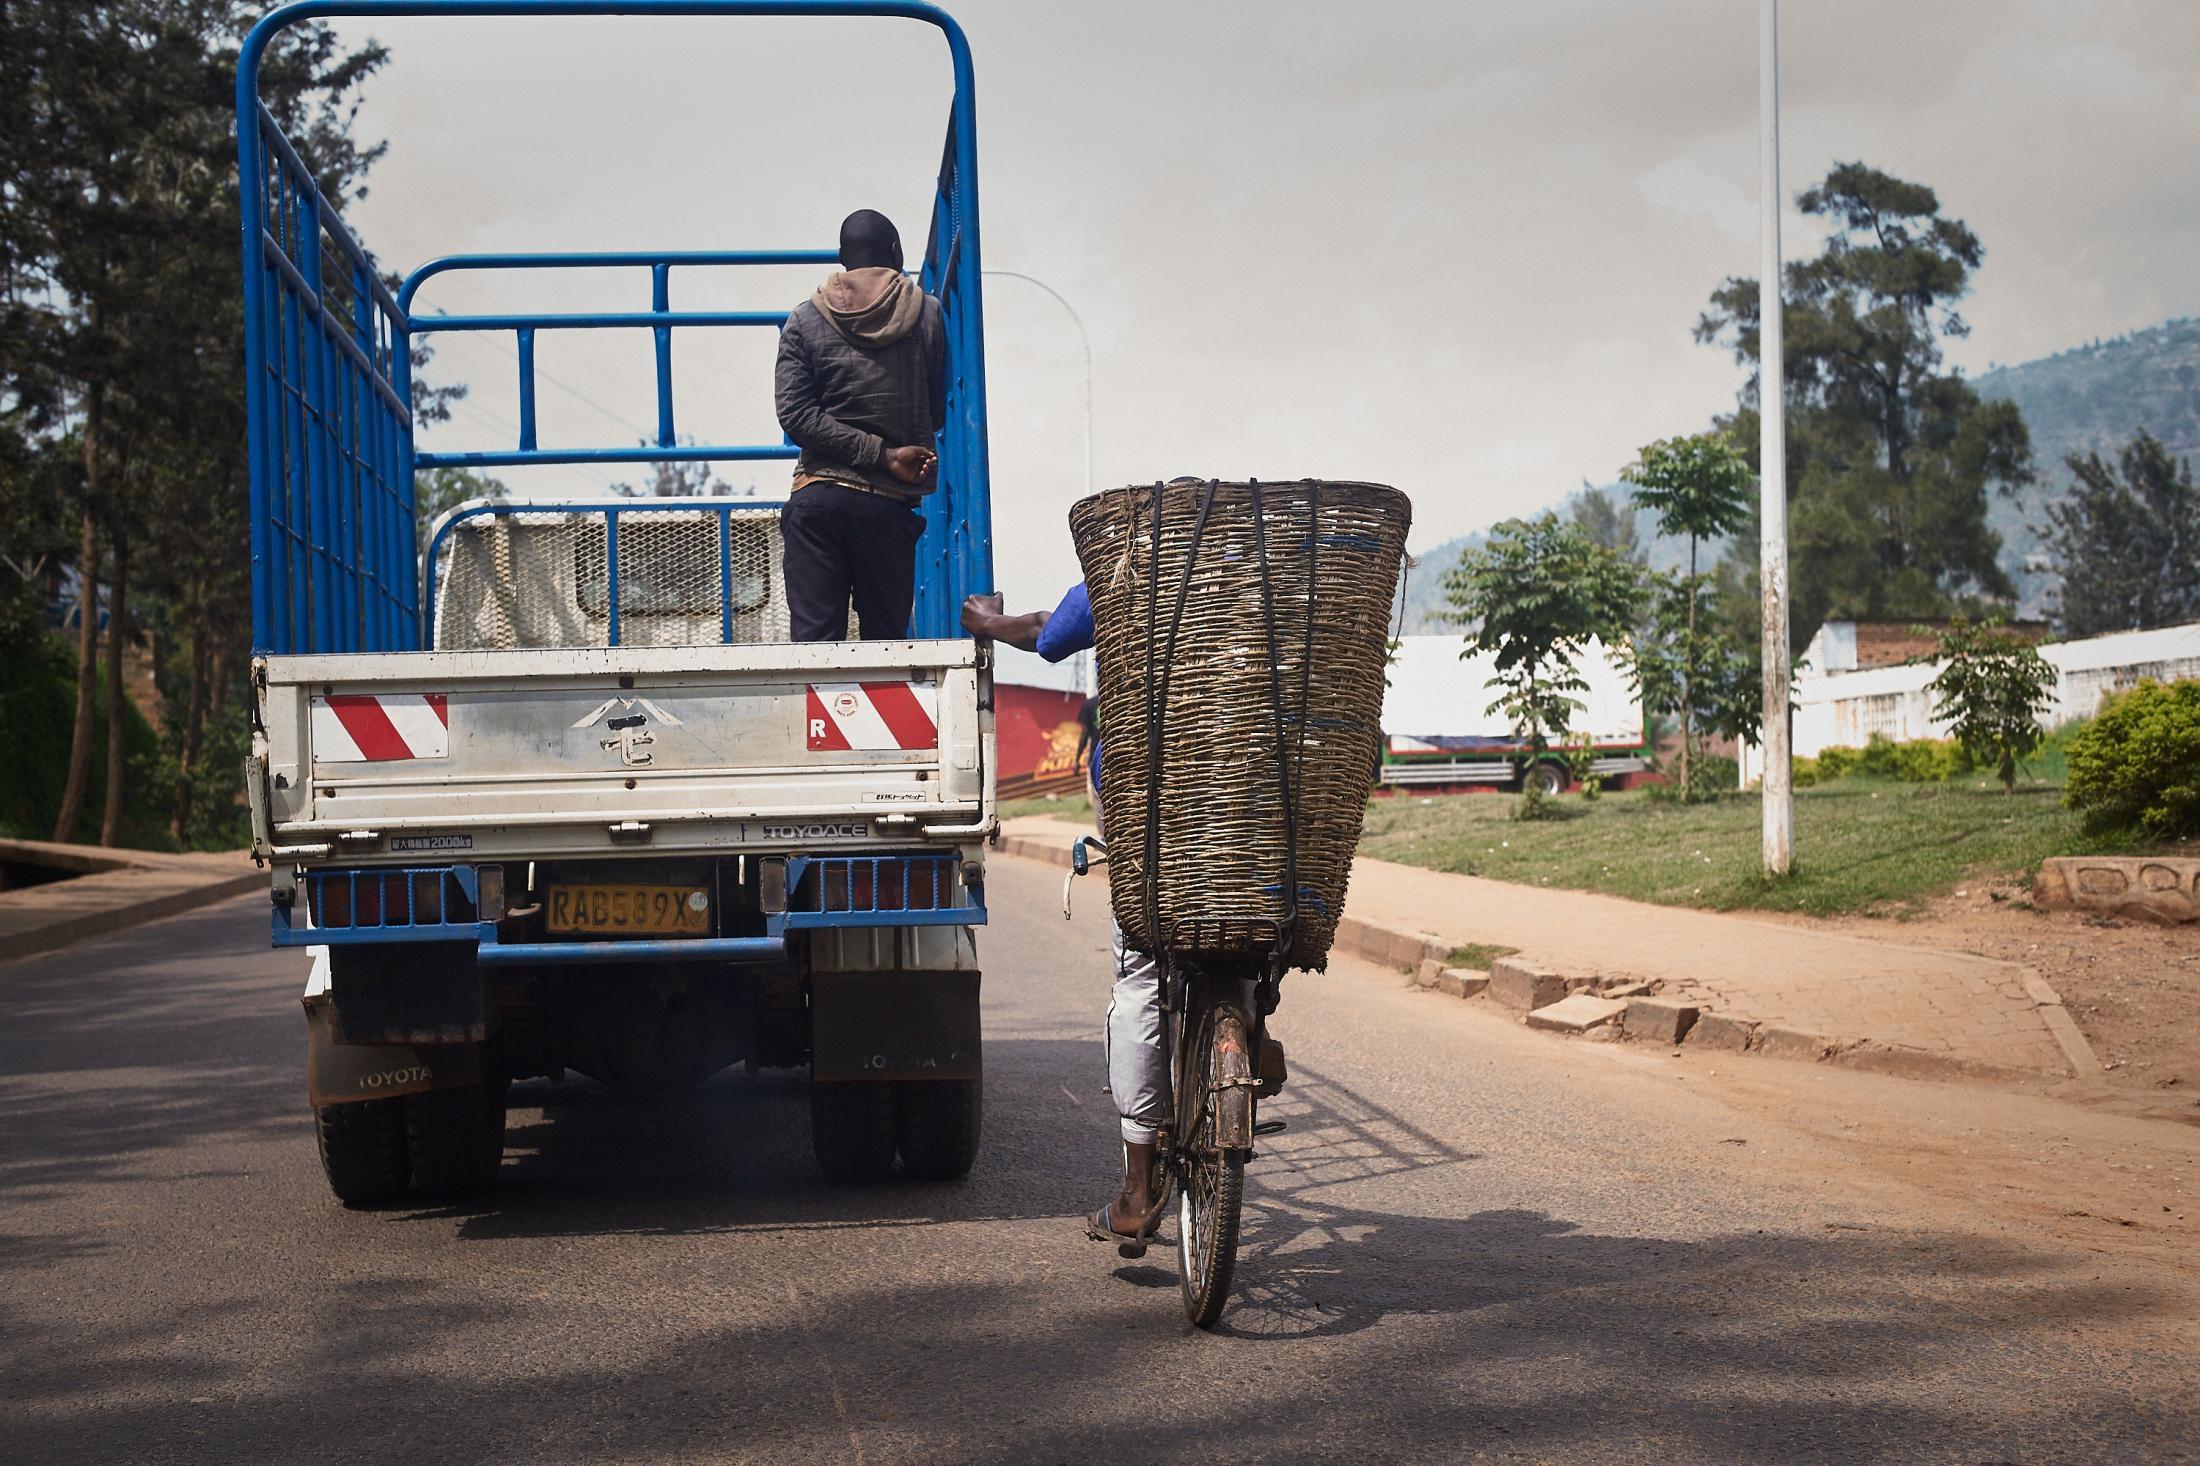 a basket full of the unknown, kigali, rwanda.